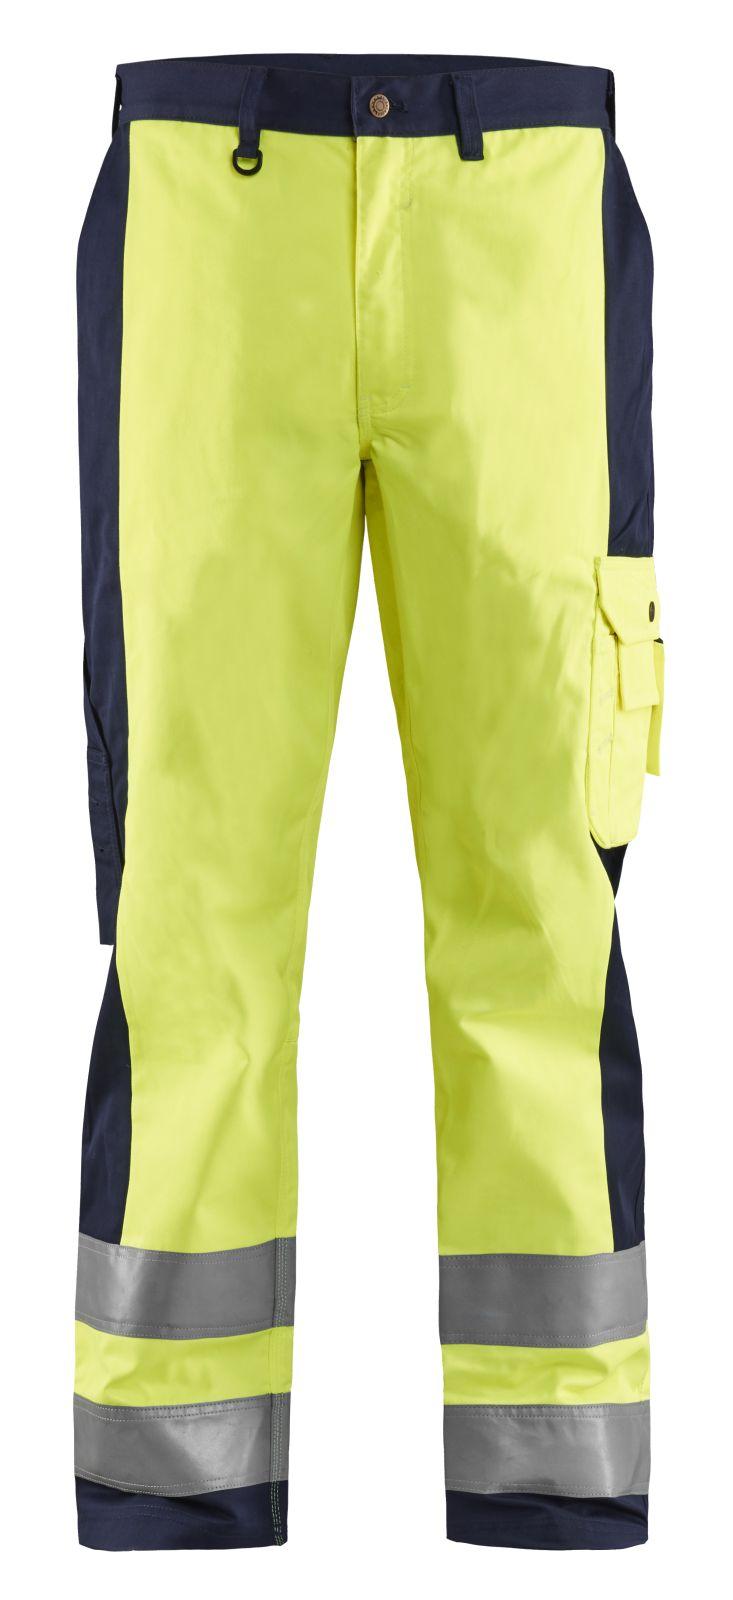 Blaklader Werkbroeken 15831860 High Vis geel-marineblauw(3389)